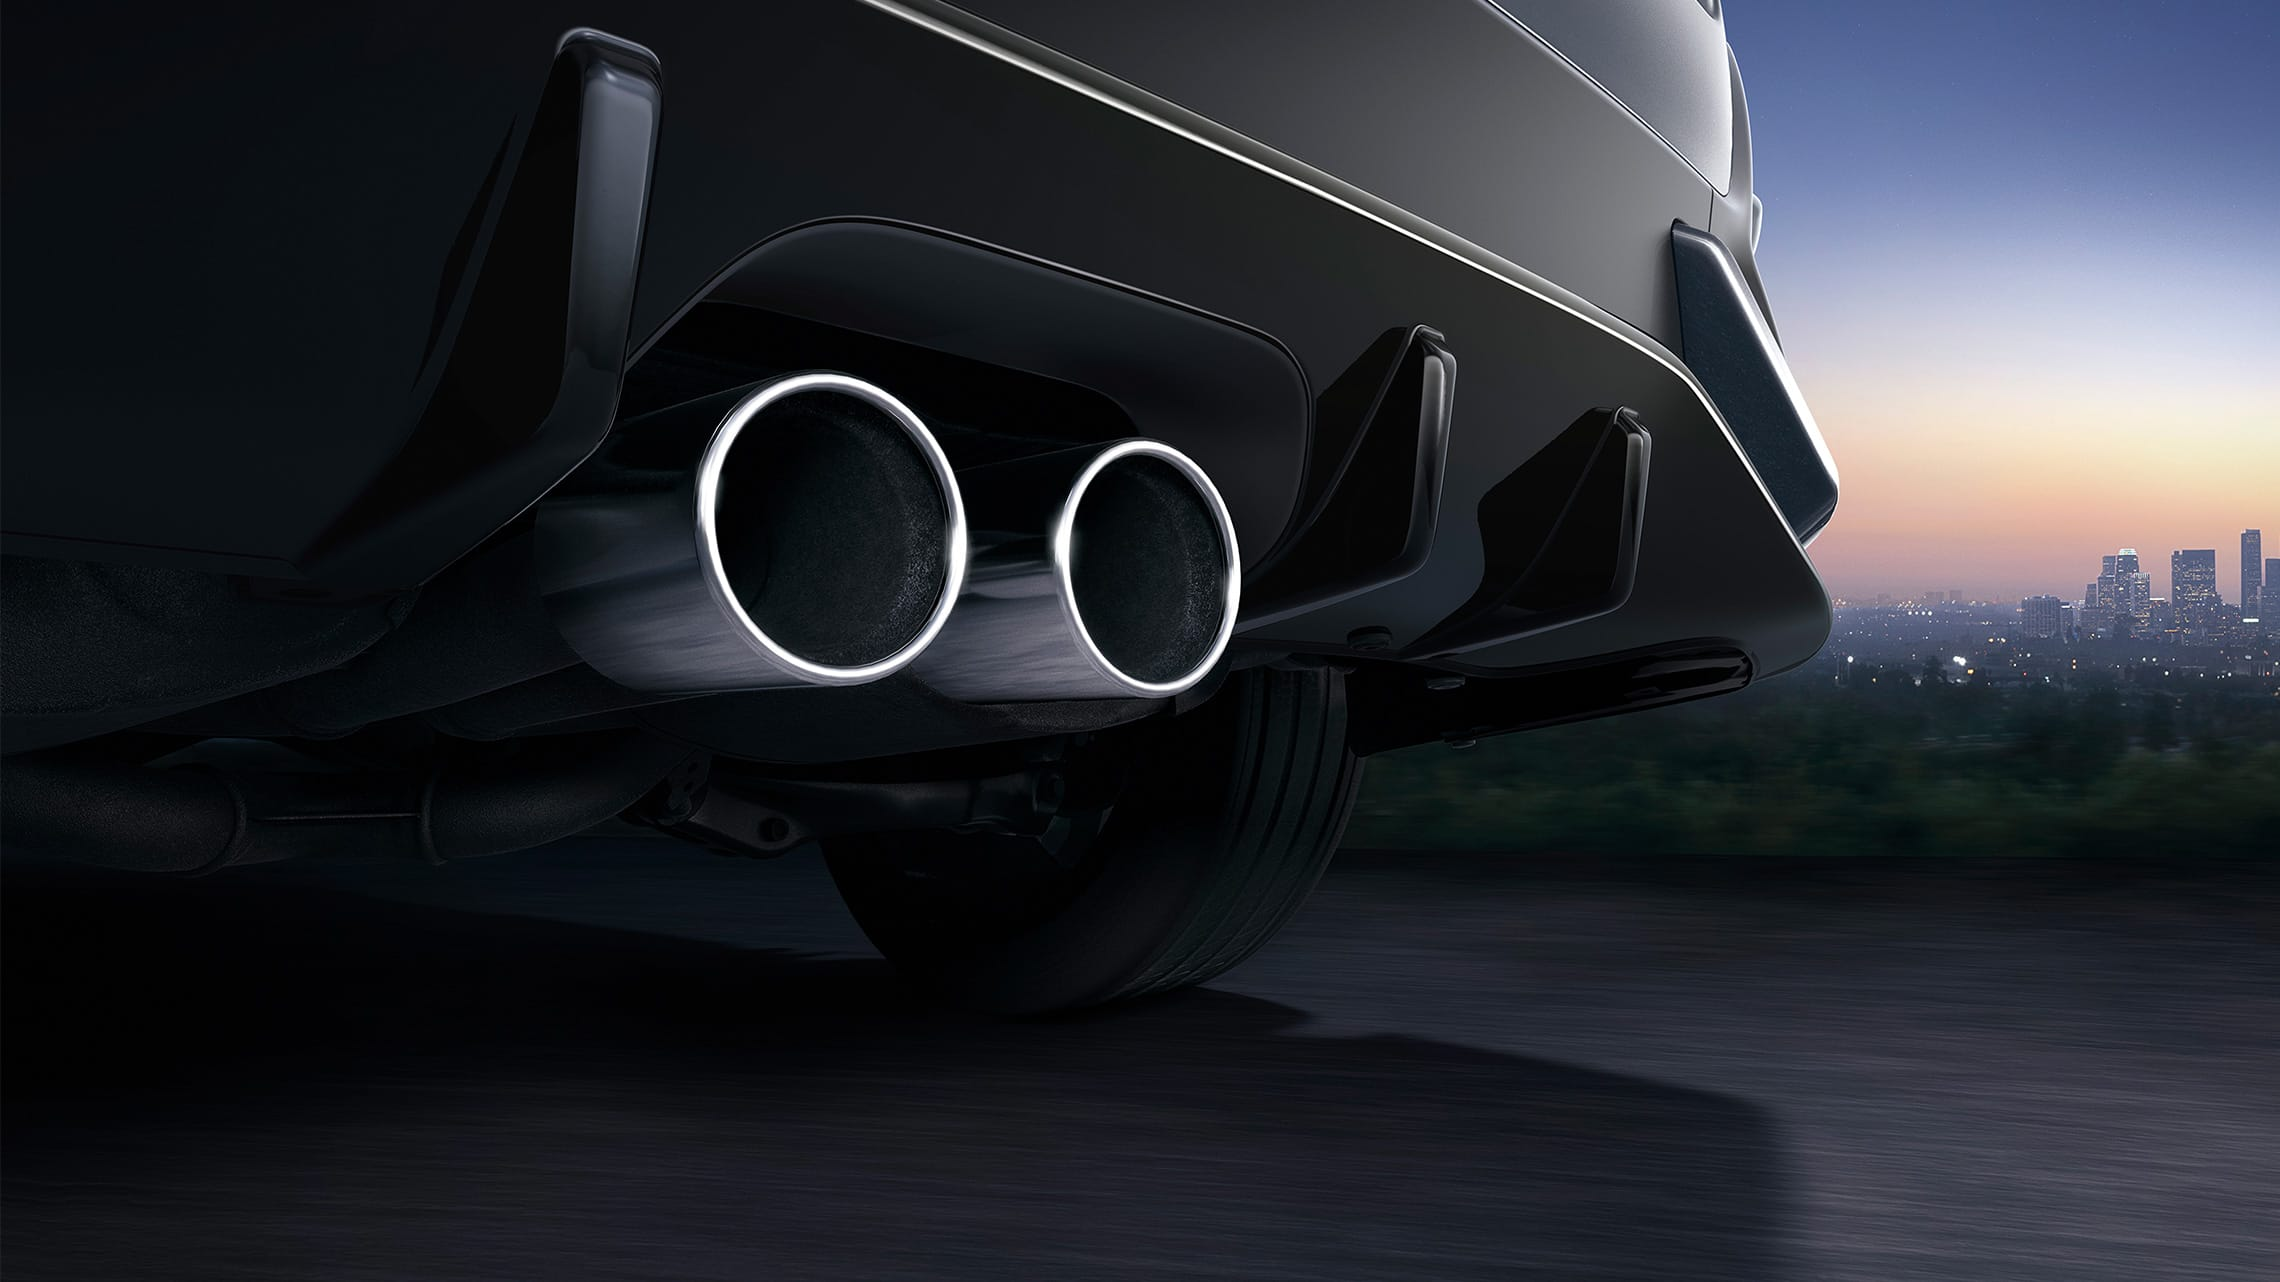 Salida de escape doble central en el Honda Civic Sport Touring Hatchback2021 en Sonic Gray Pearl.